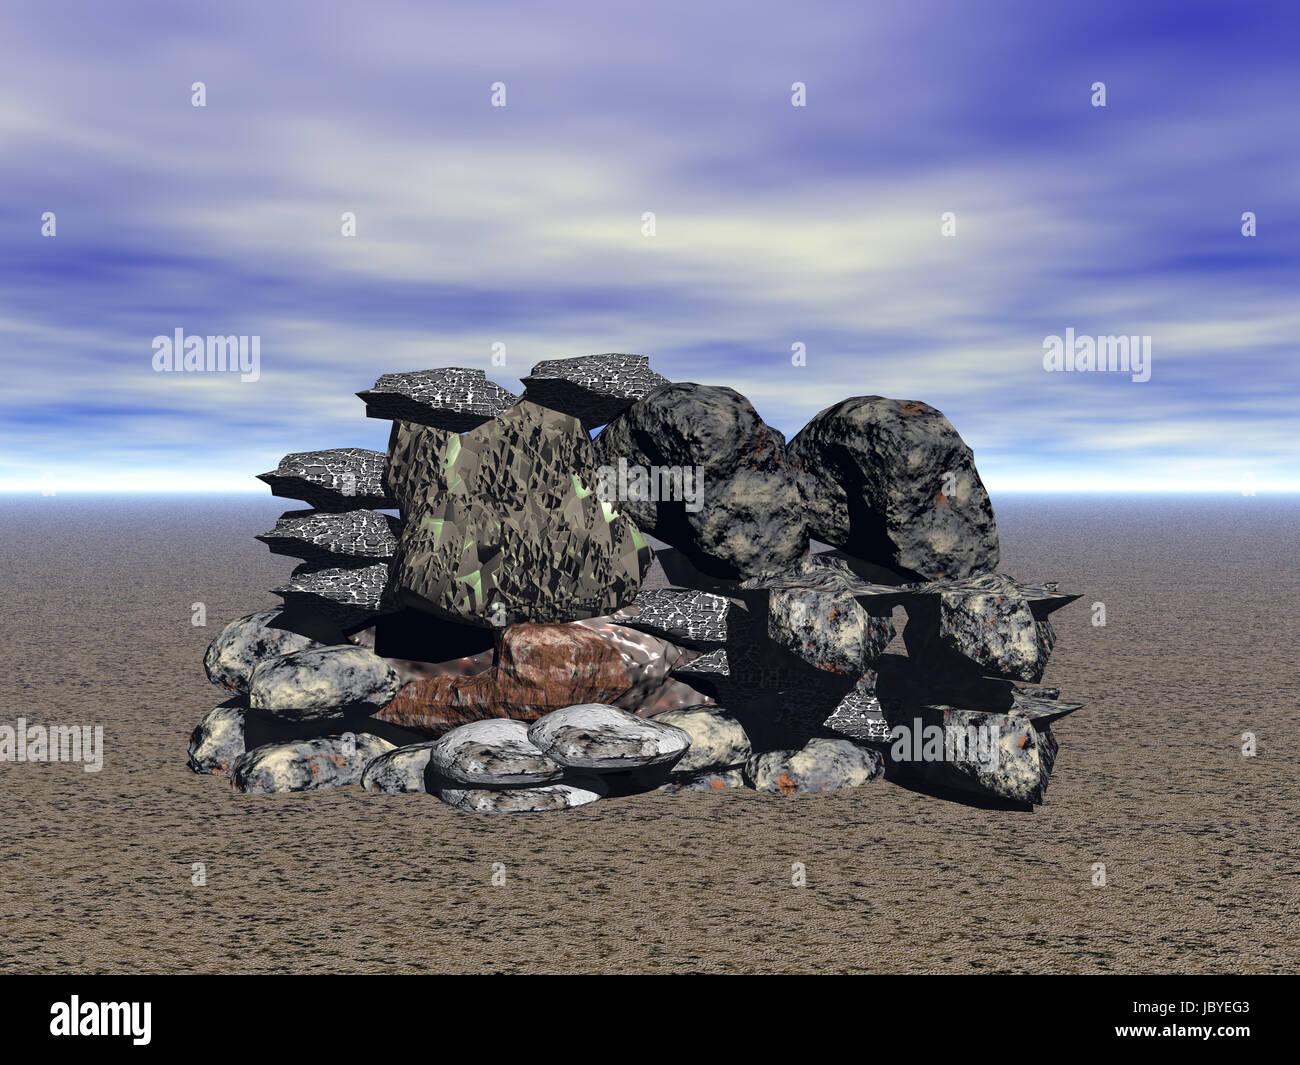 Einsamkeit Computer graphics Stockbild